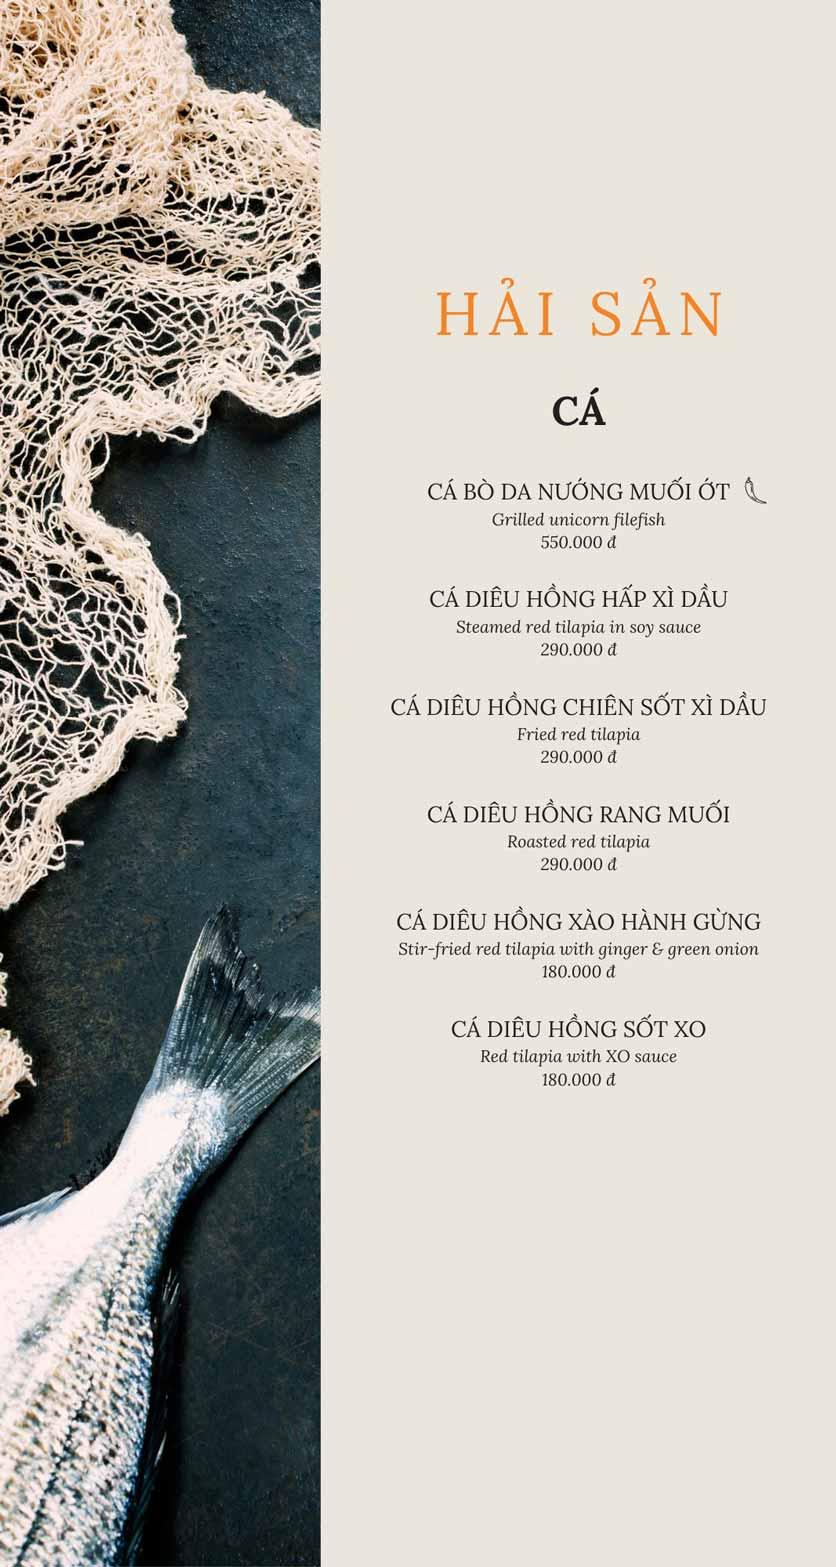 Menu SIGN By A1 - Trung Hòa 8